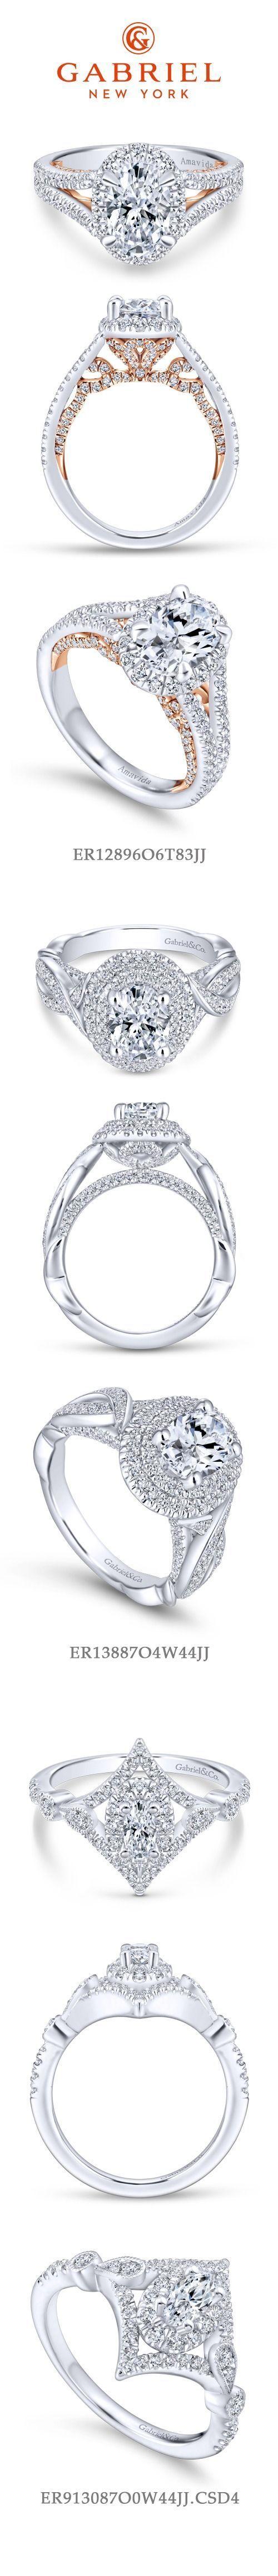 14 best Ring images on Pinterest